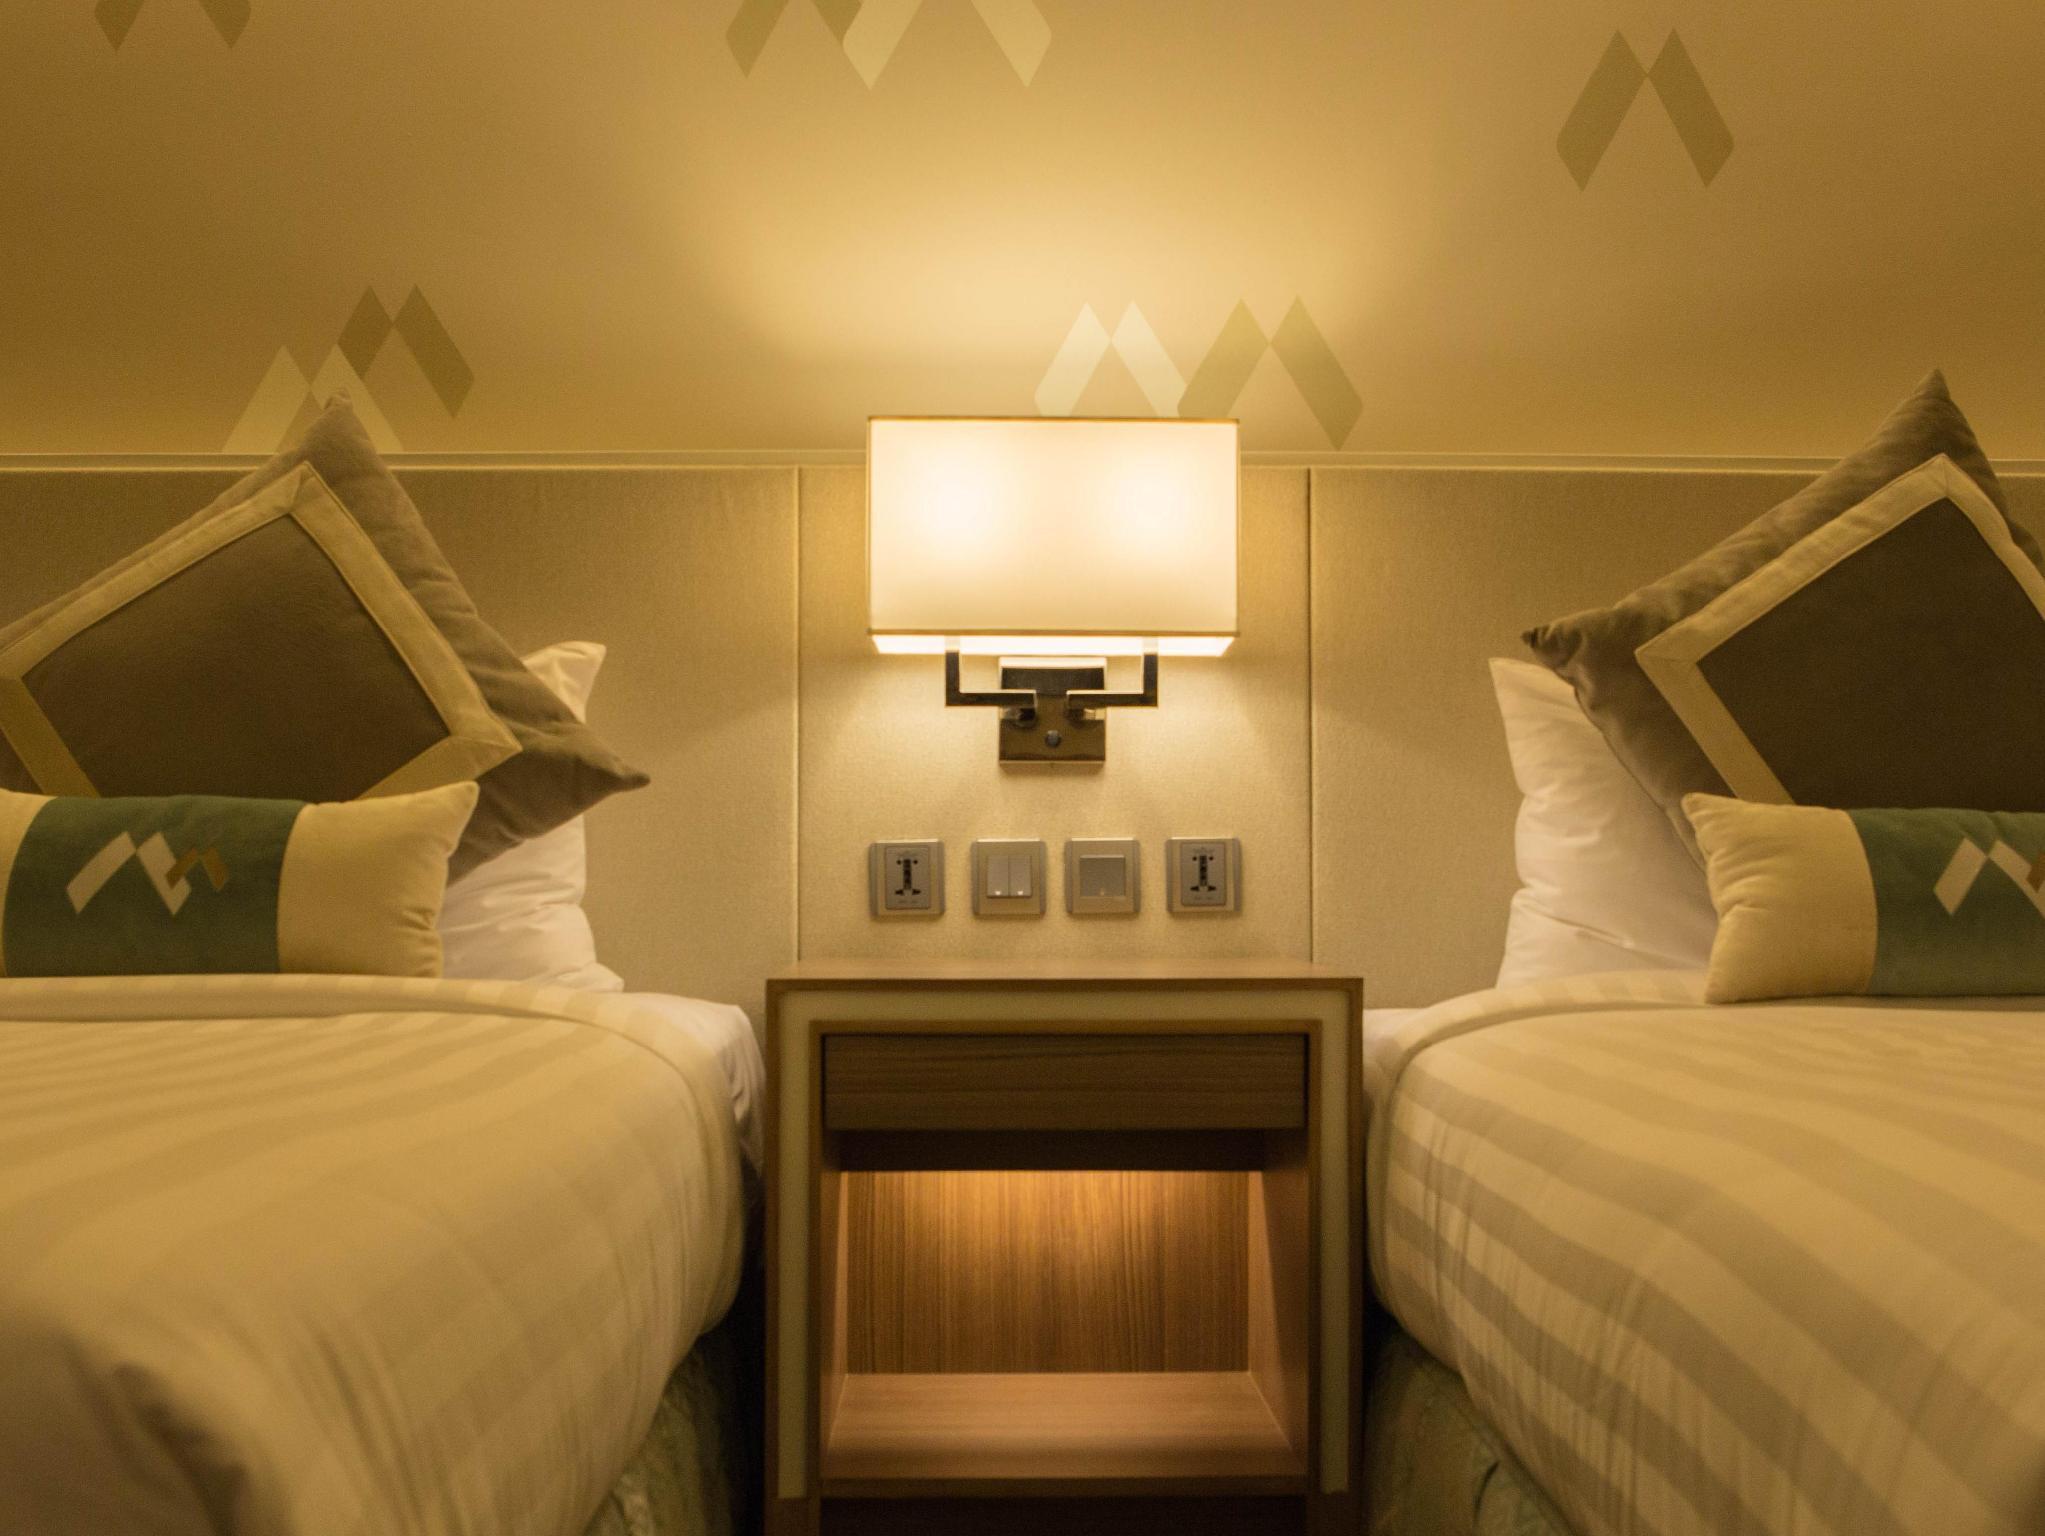 Maison De La Salle hotel benilde maison de la salle in manila - room deals